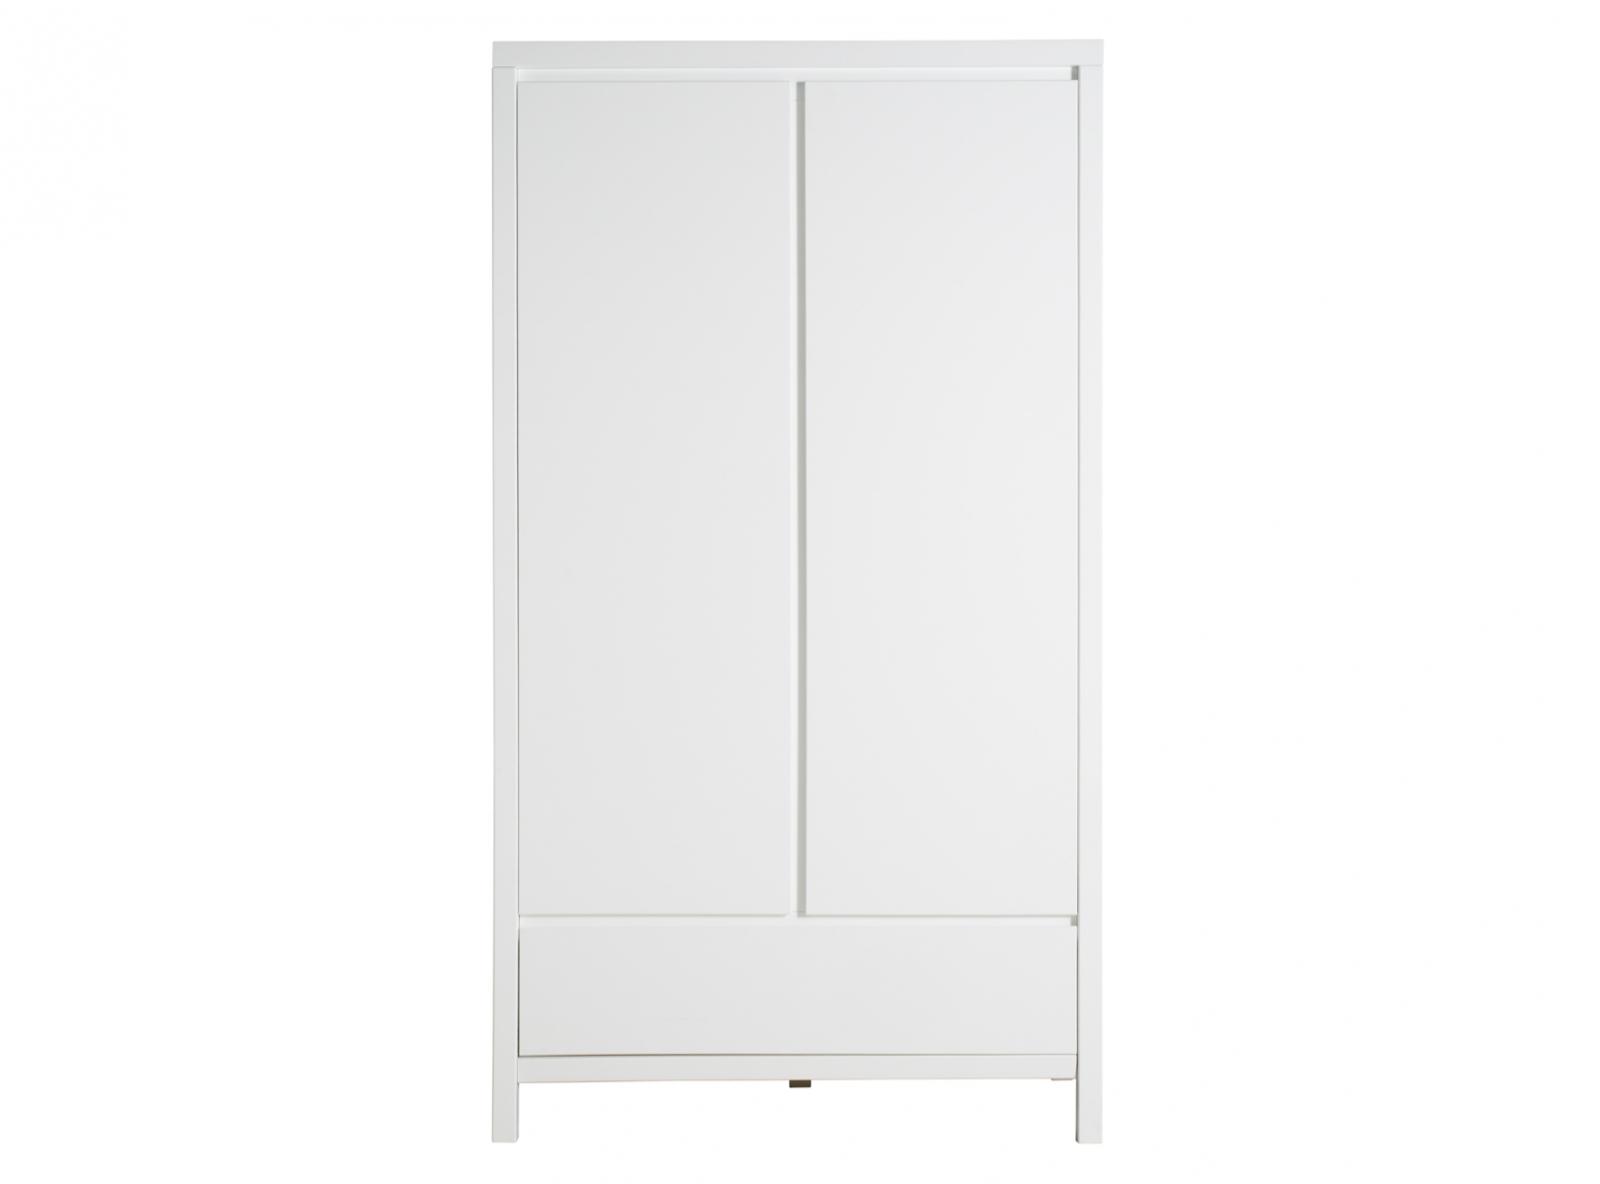 Bopita Corsica 2-Door Wardrobe XL With Drawer